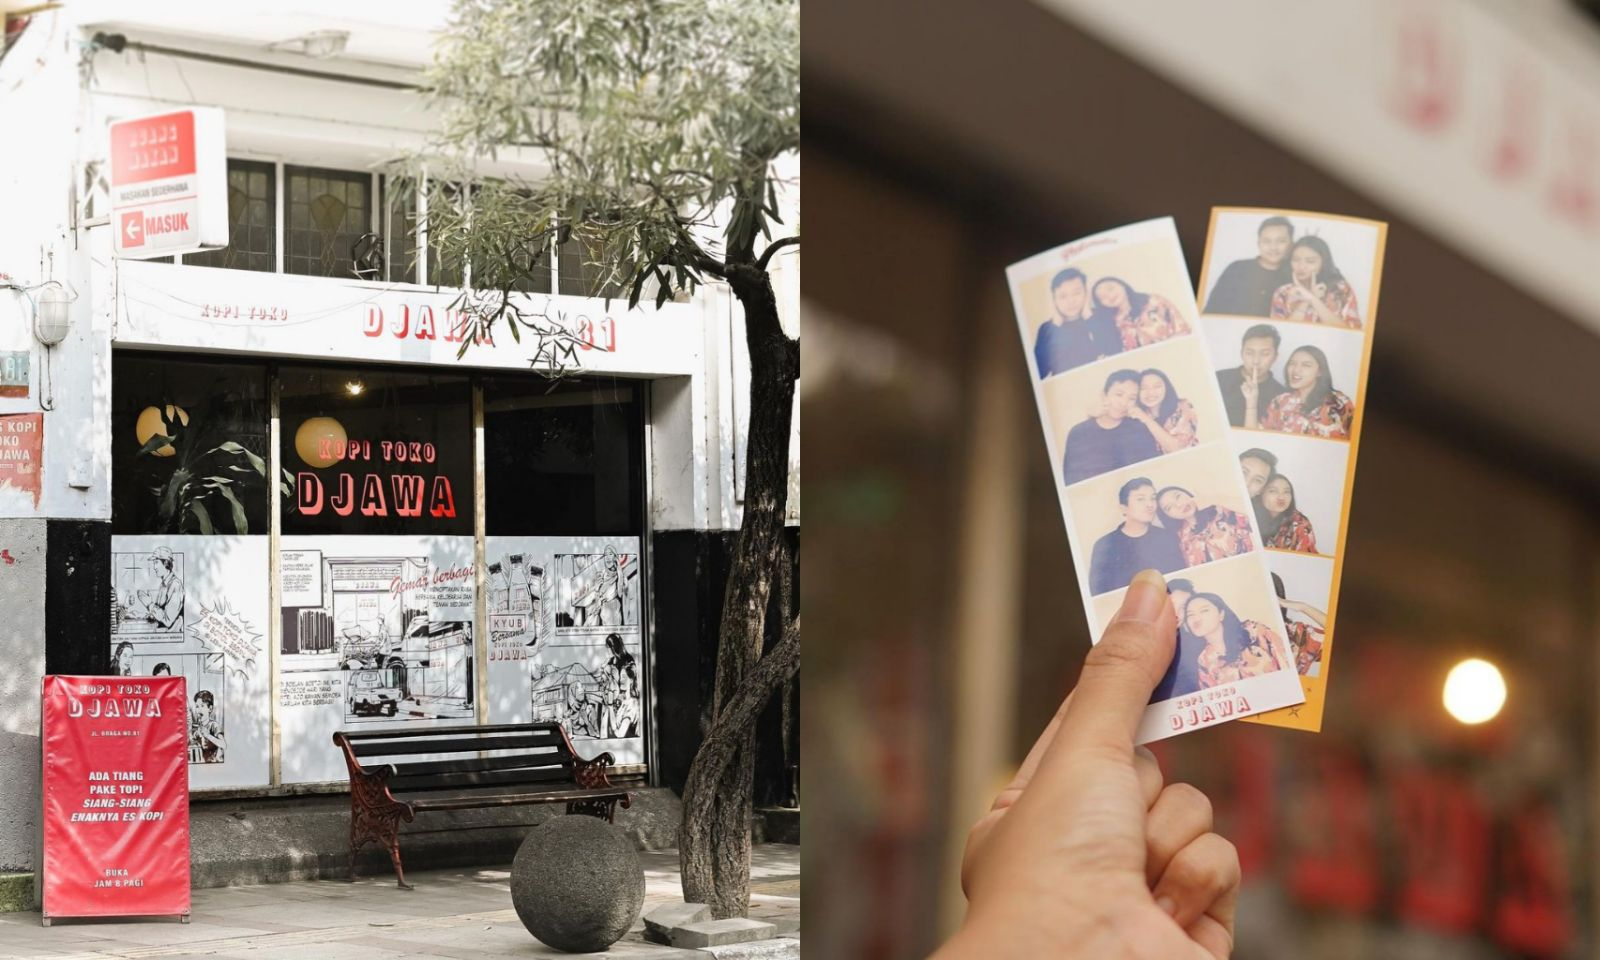 Kopi Toko Djawa, Braga - Photobooth Photobox Kekinian Di Jakarta Dan Bandung